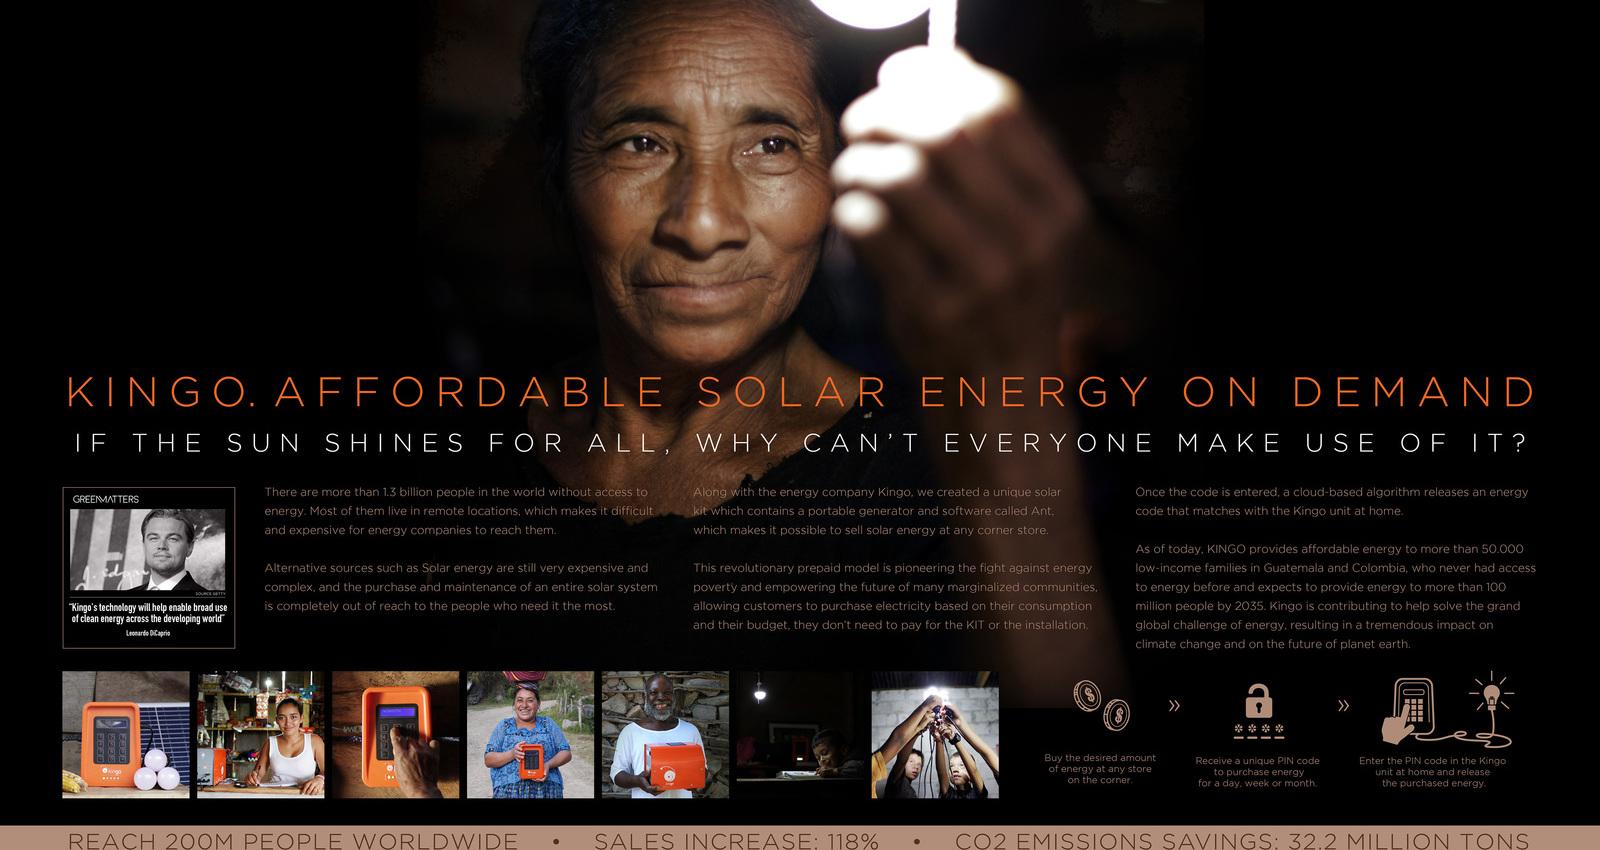 KINGO. affordable solar energy on demand